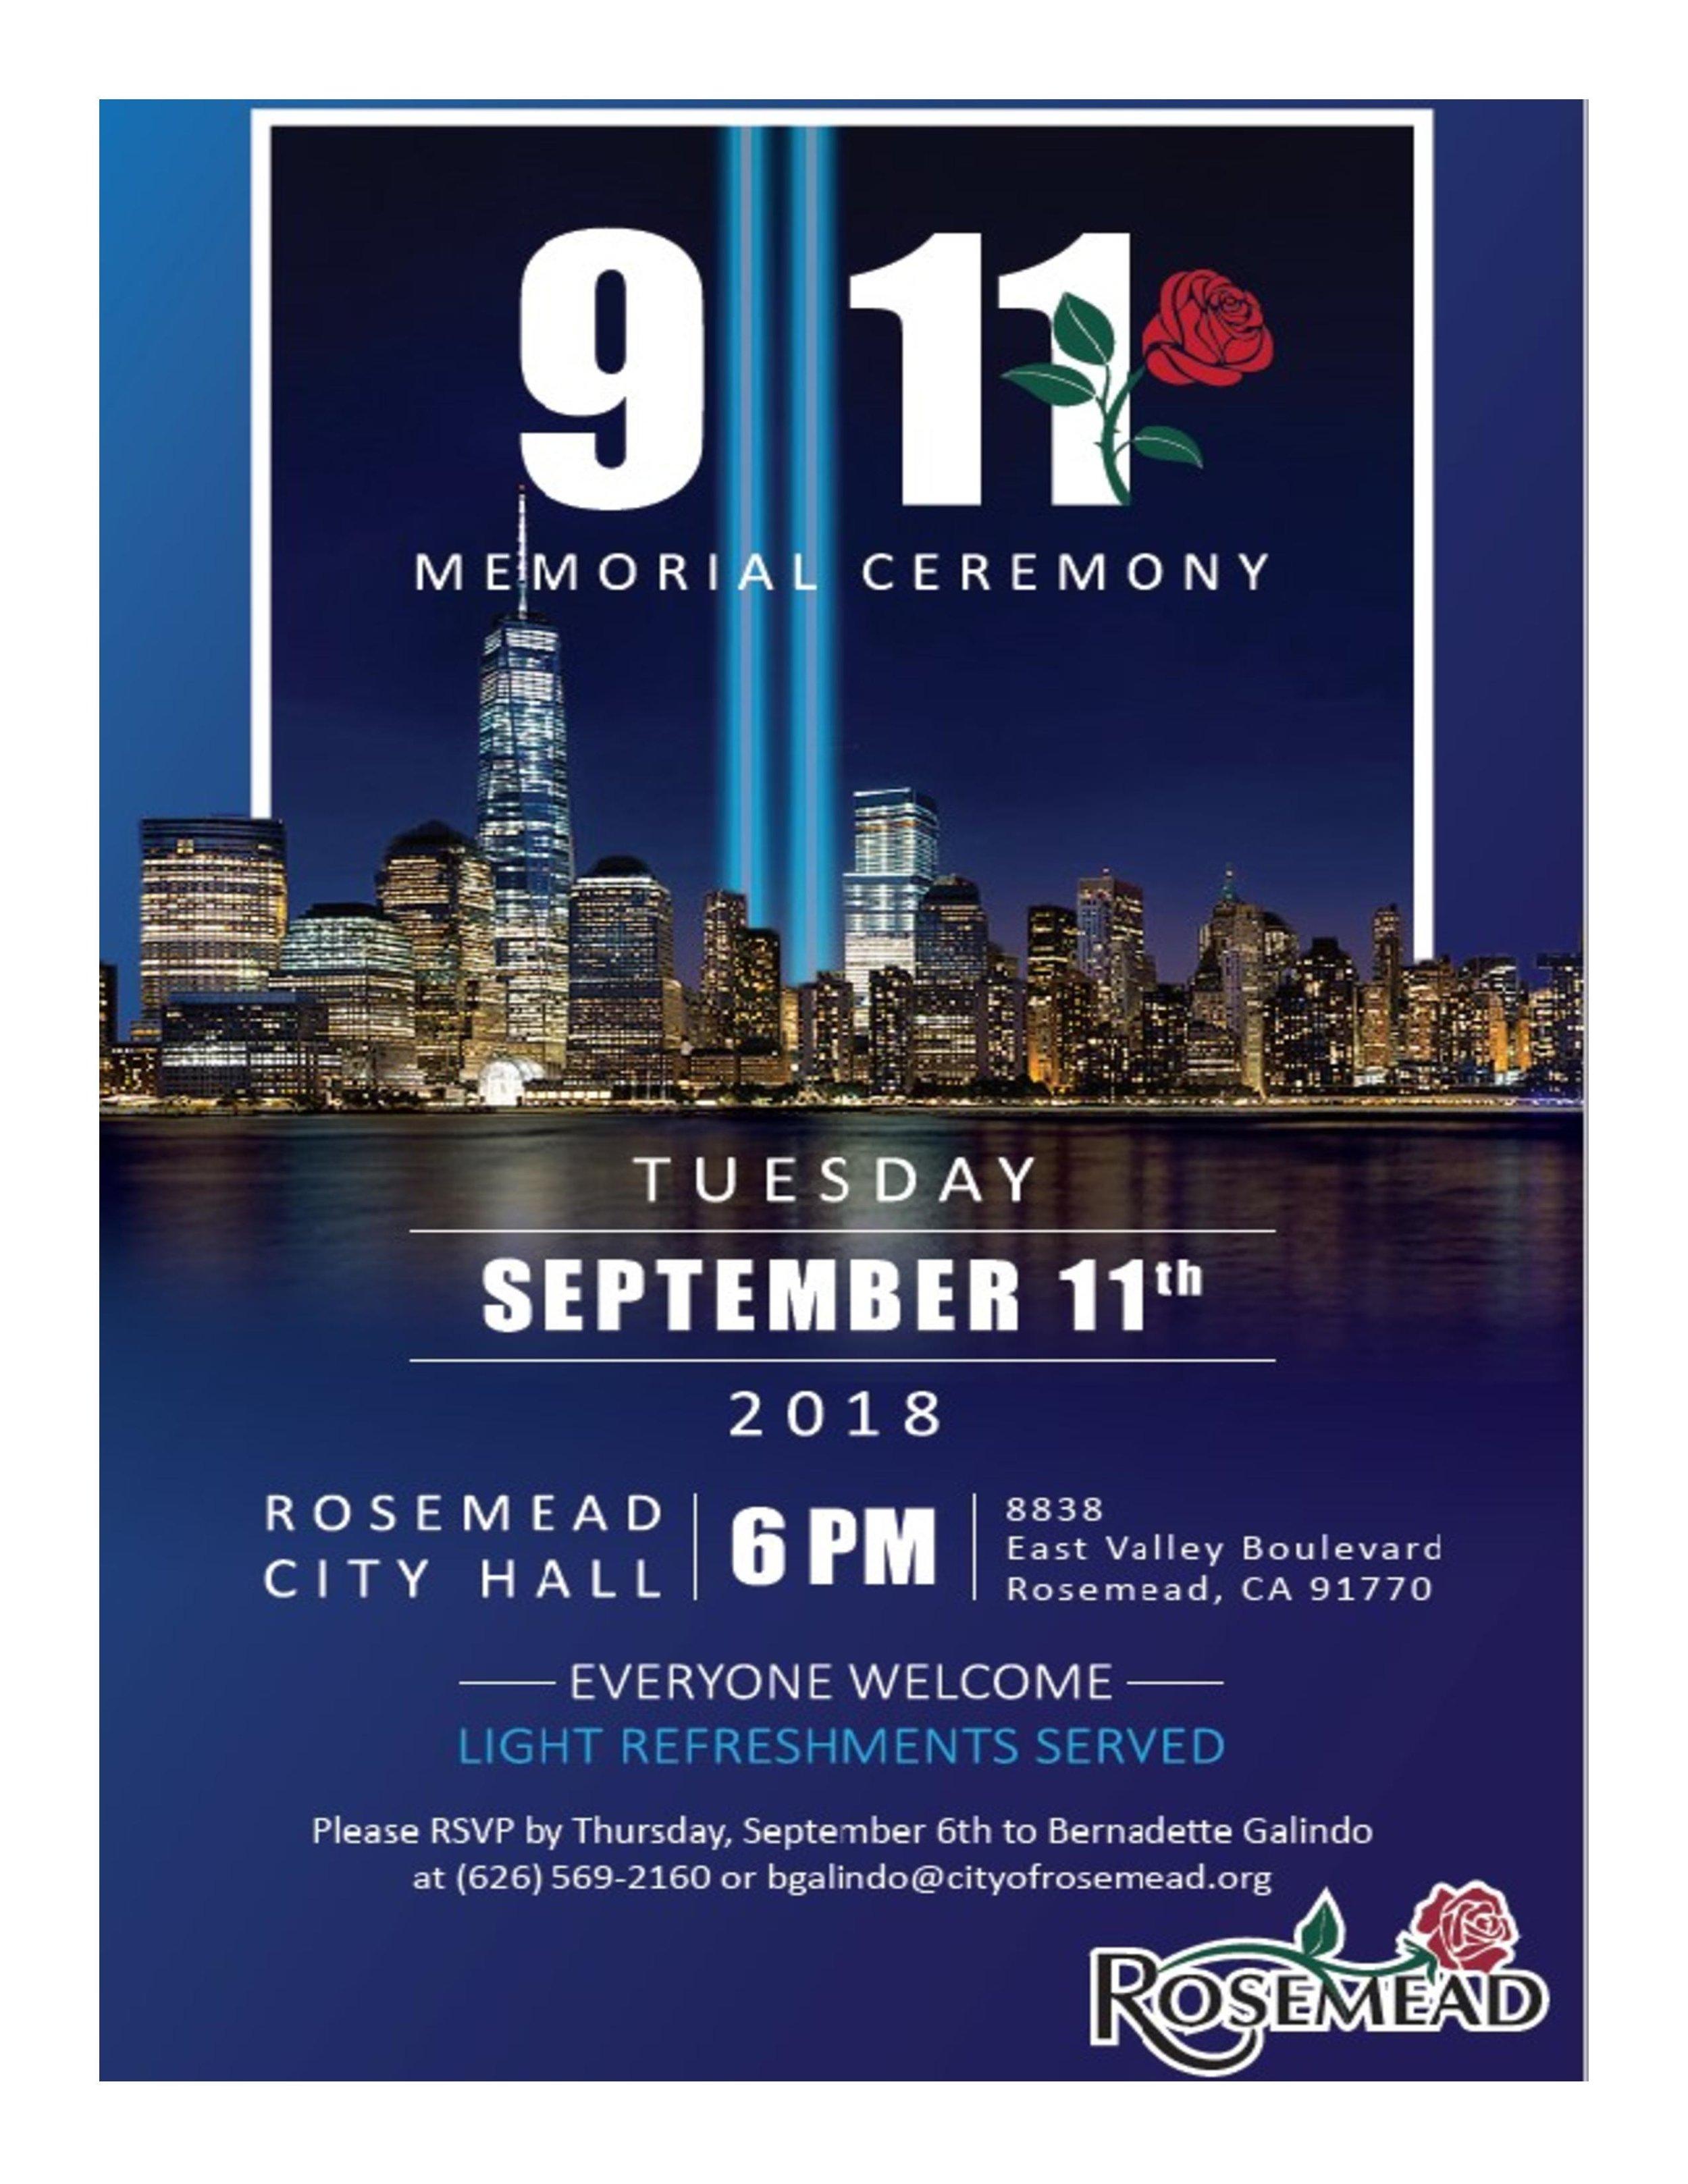 911 Memorial Ceremony - September 11th, 2018